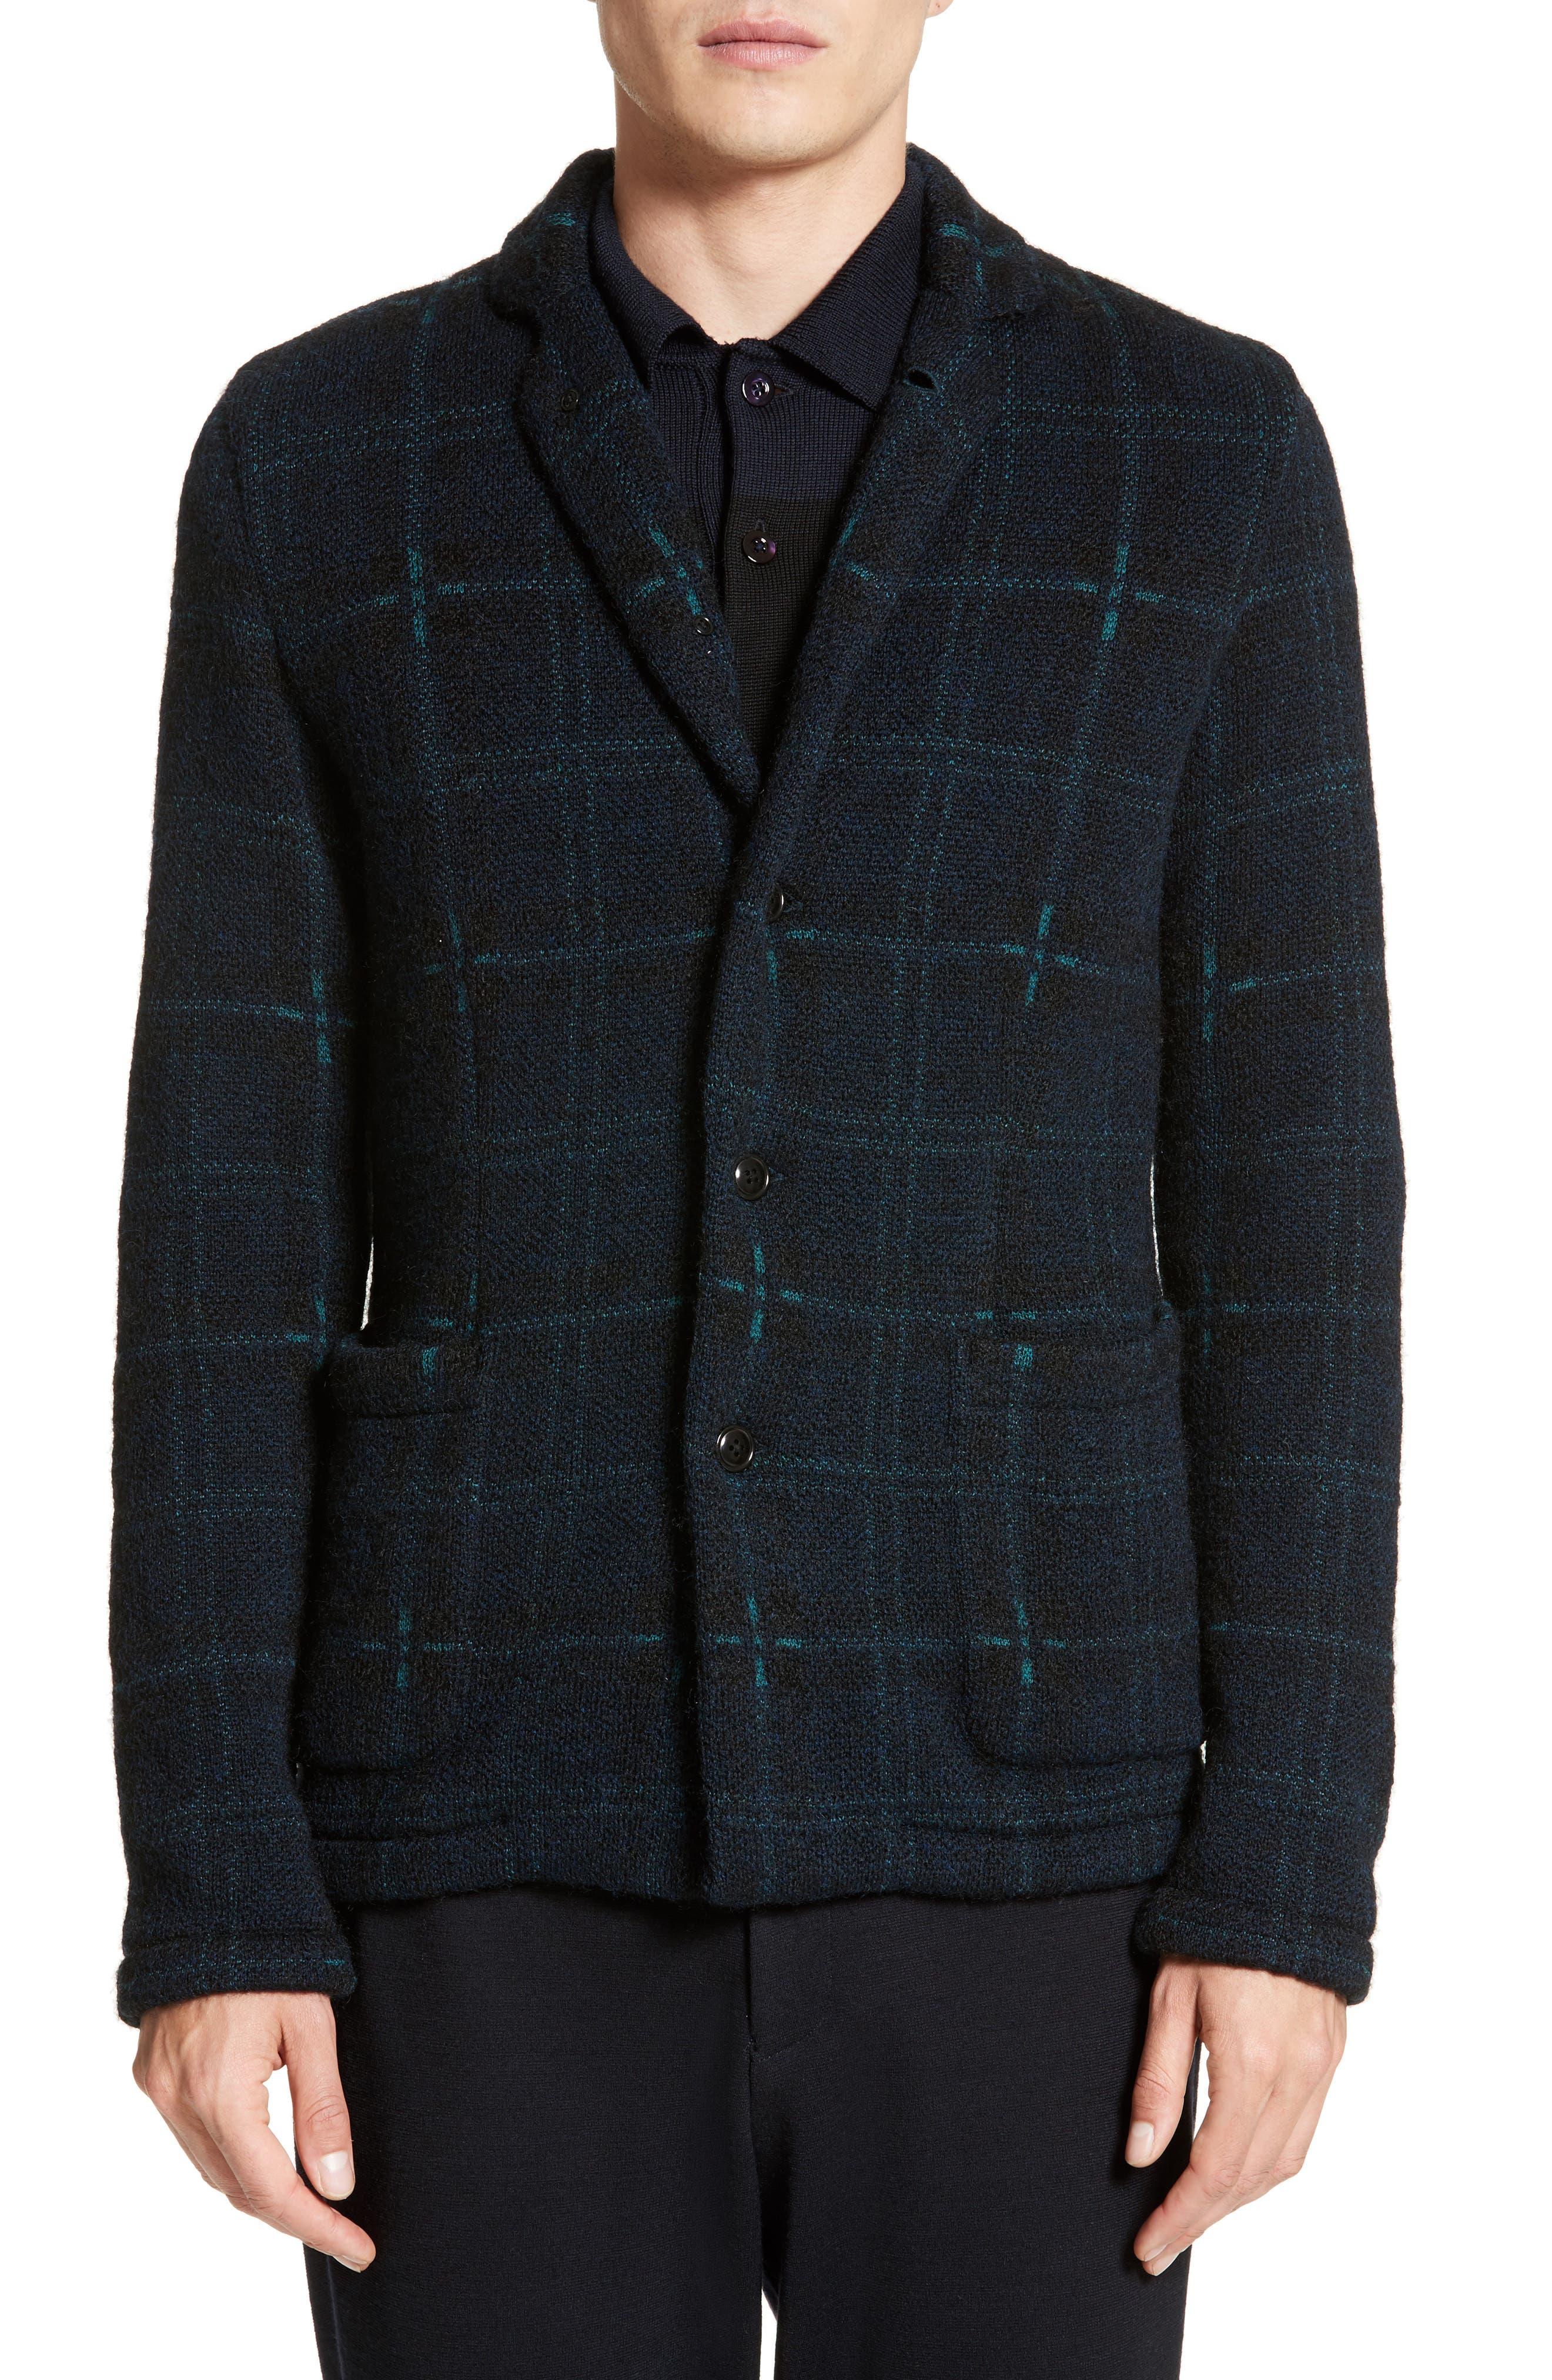 Main Image - Tomorrowland Wool Blend Knit Sportcoat